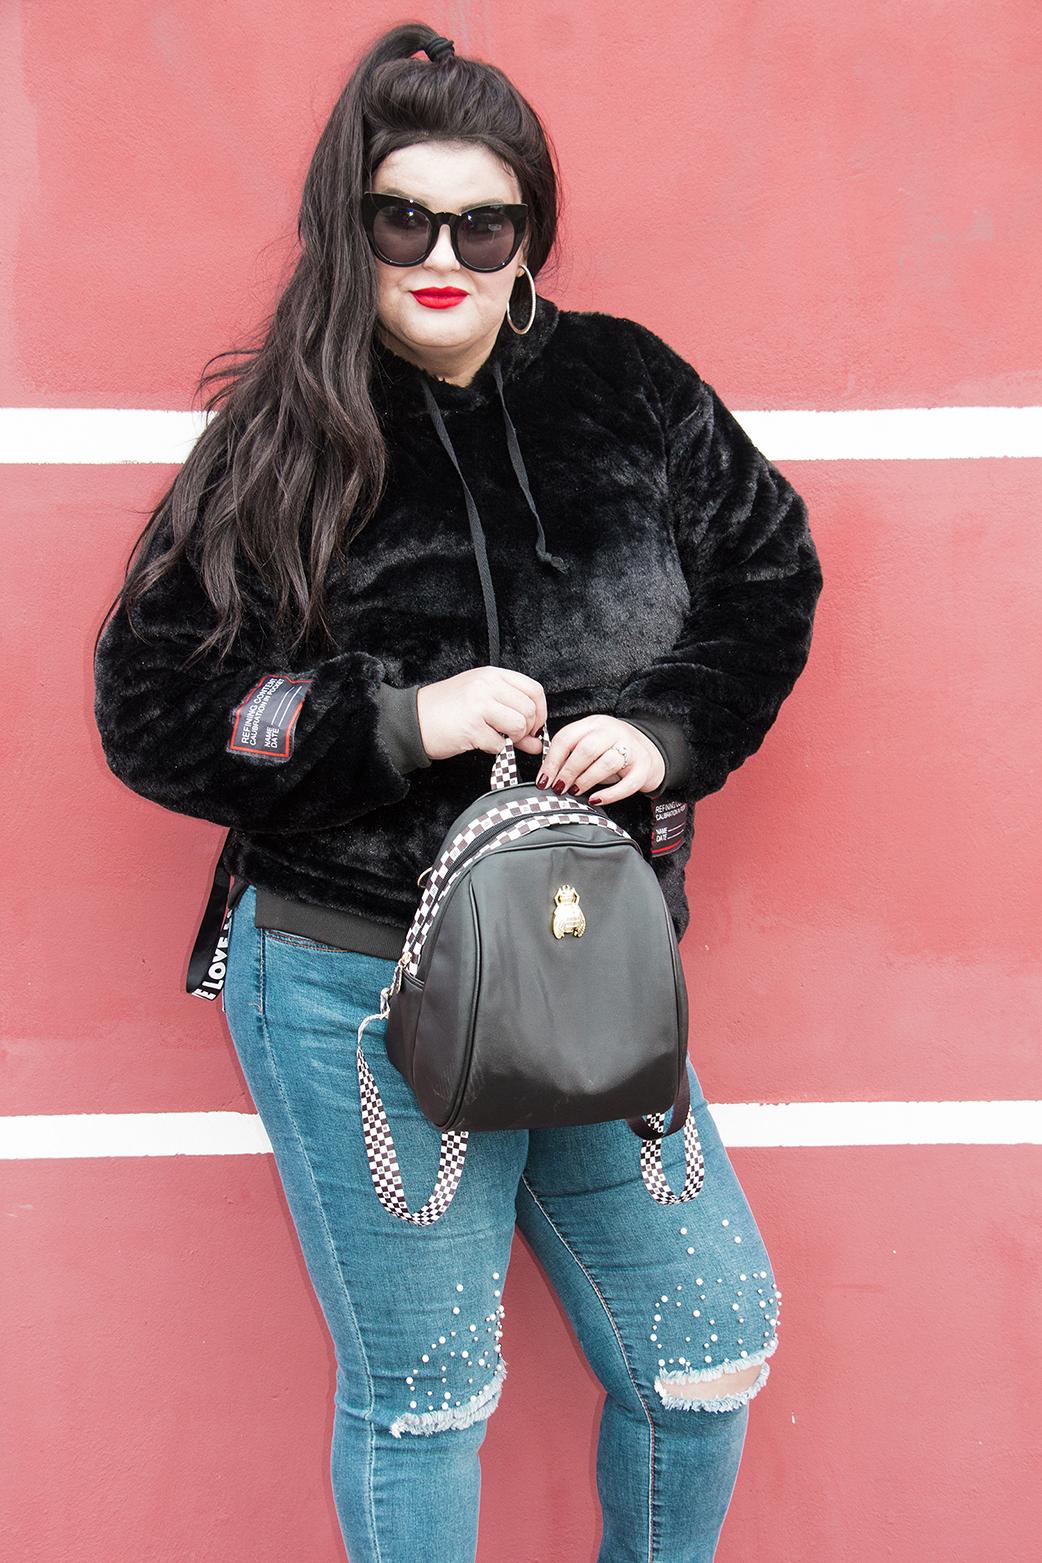 Shein: roupa plus size contemporânea e barata vindo da China!